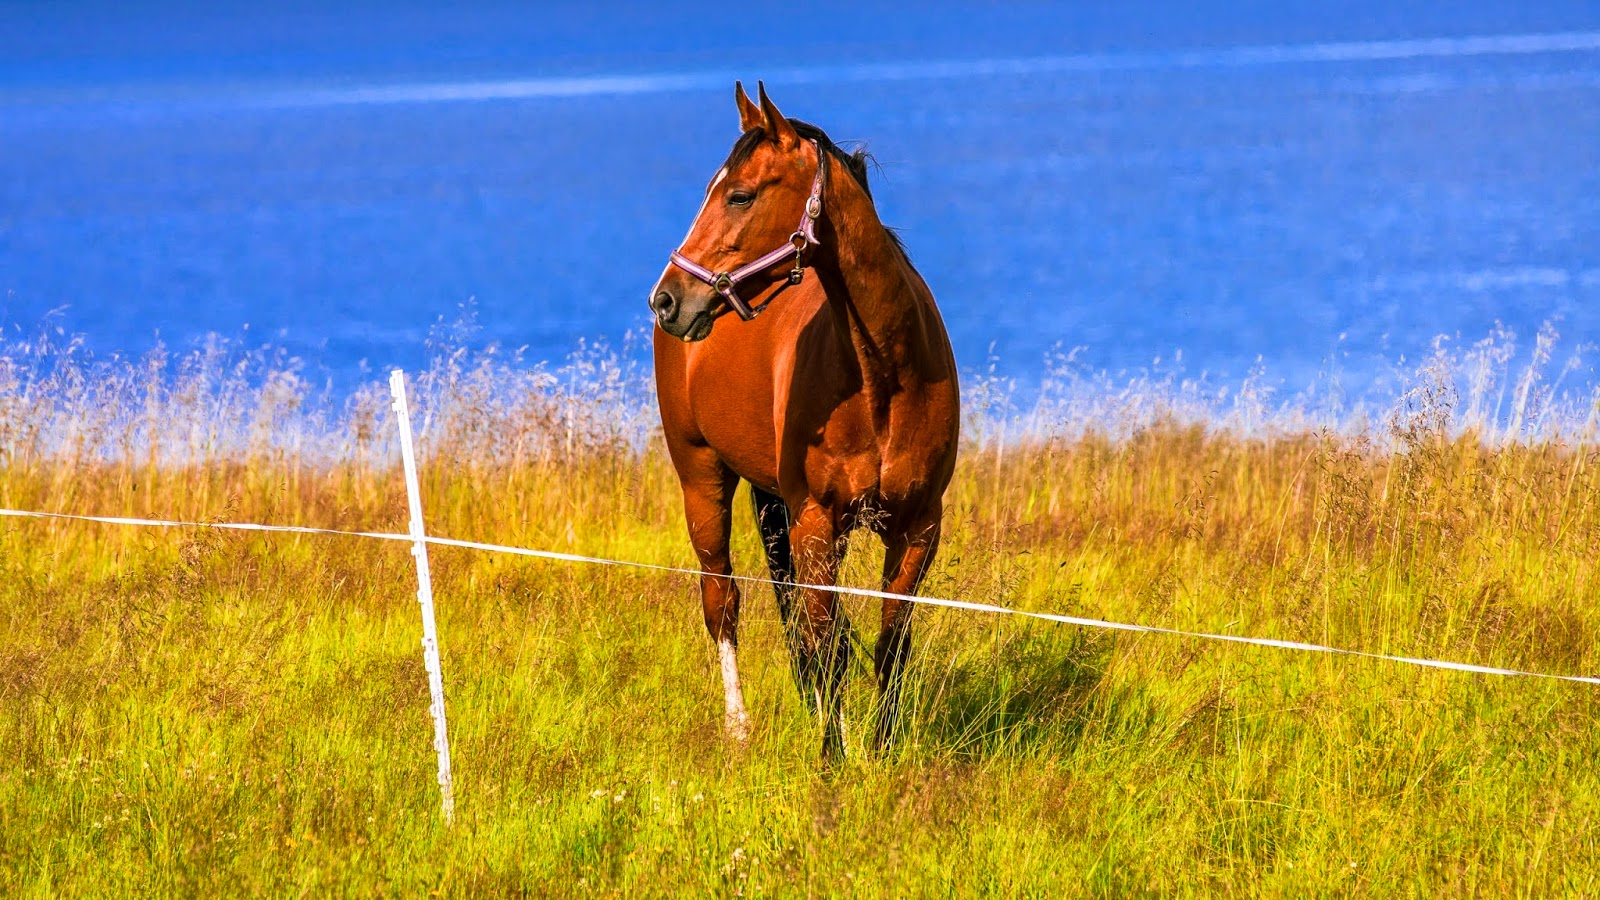 Wonderful   Wallpaper Horse Windows - Animals+WALLPAPERS+softvares4u+(1)  Gallery_628226.jpg